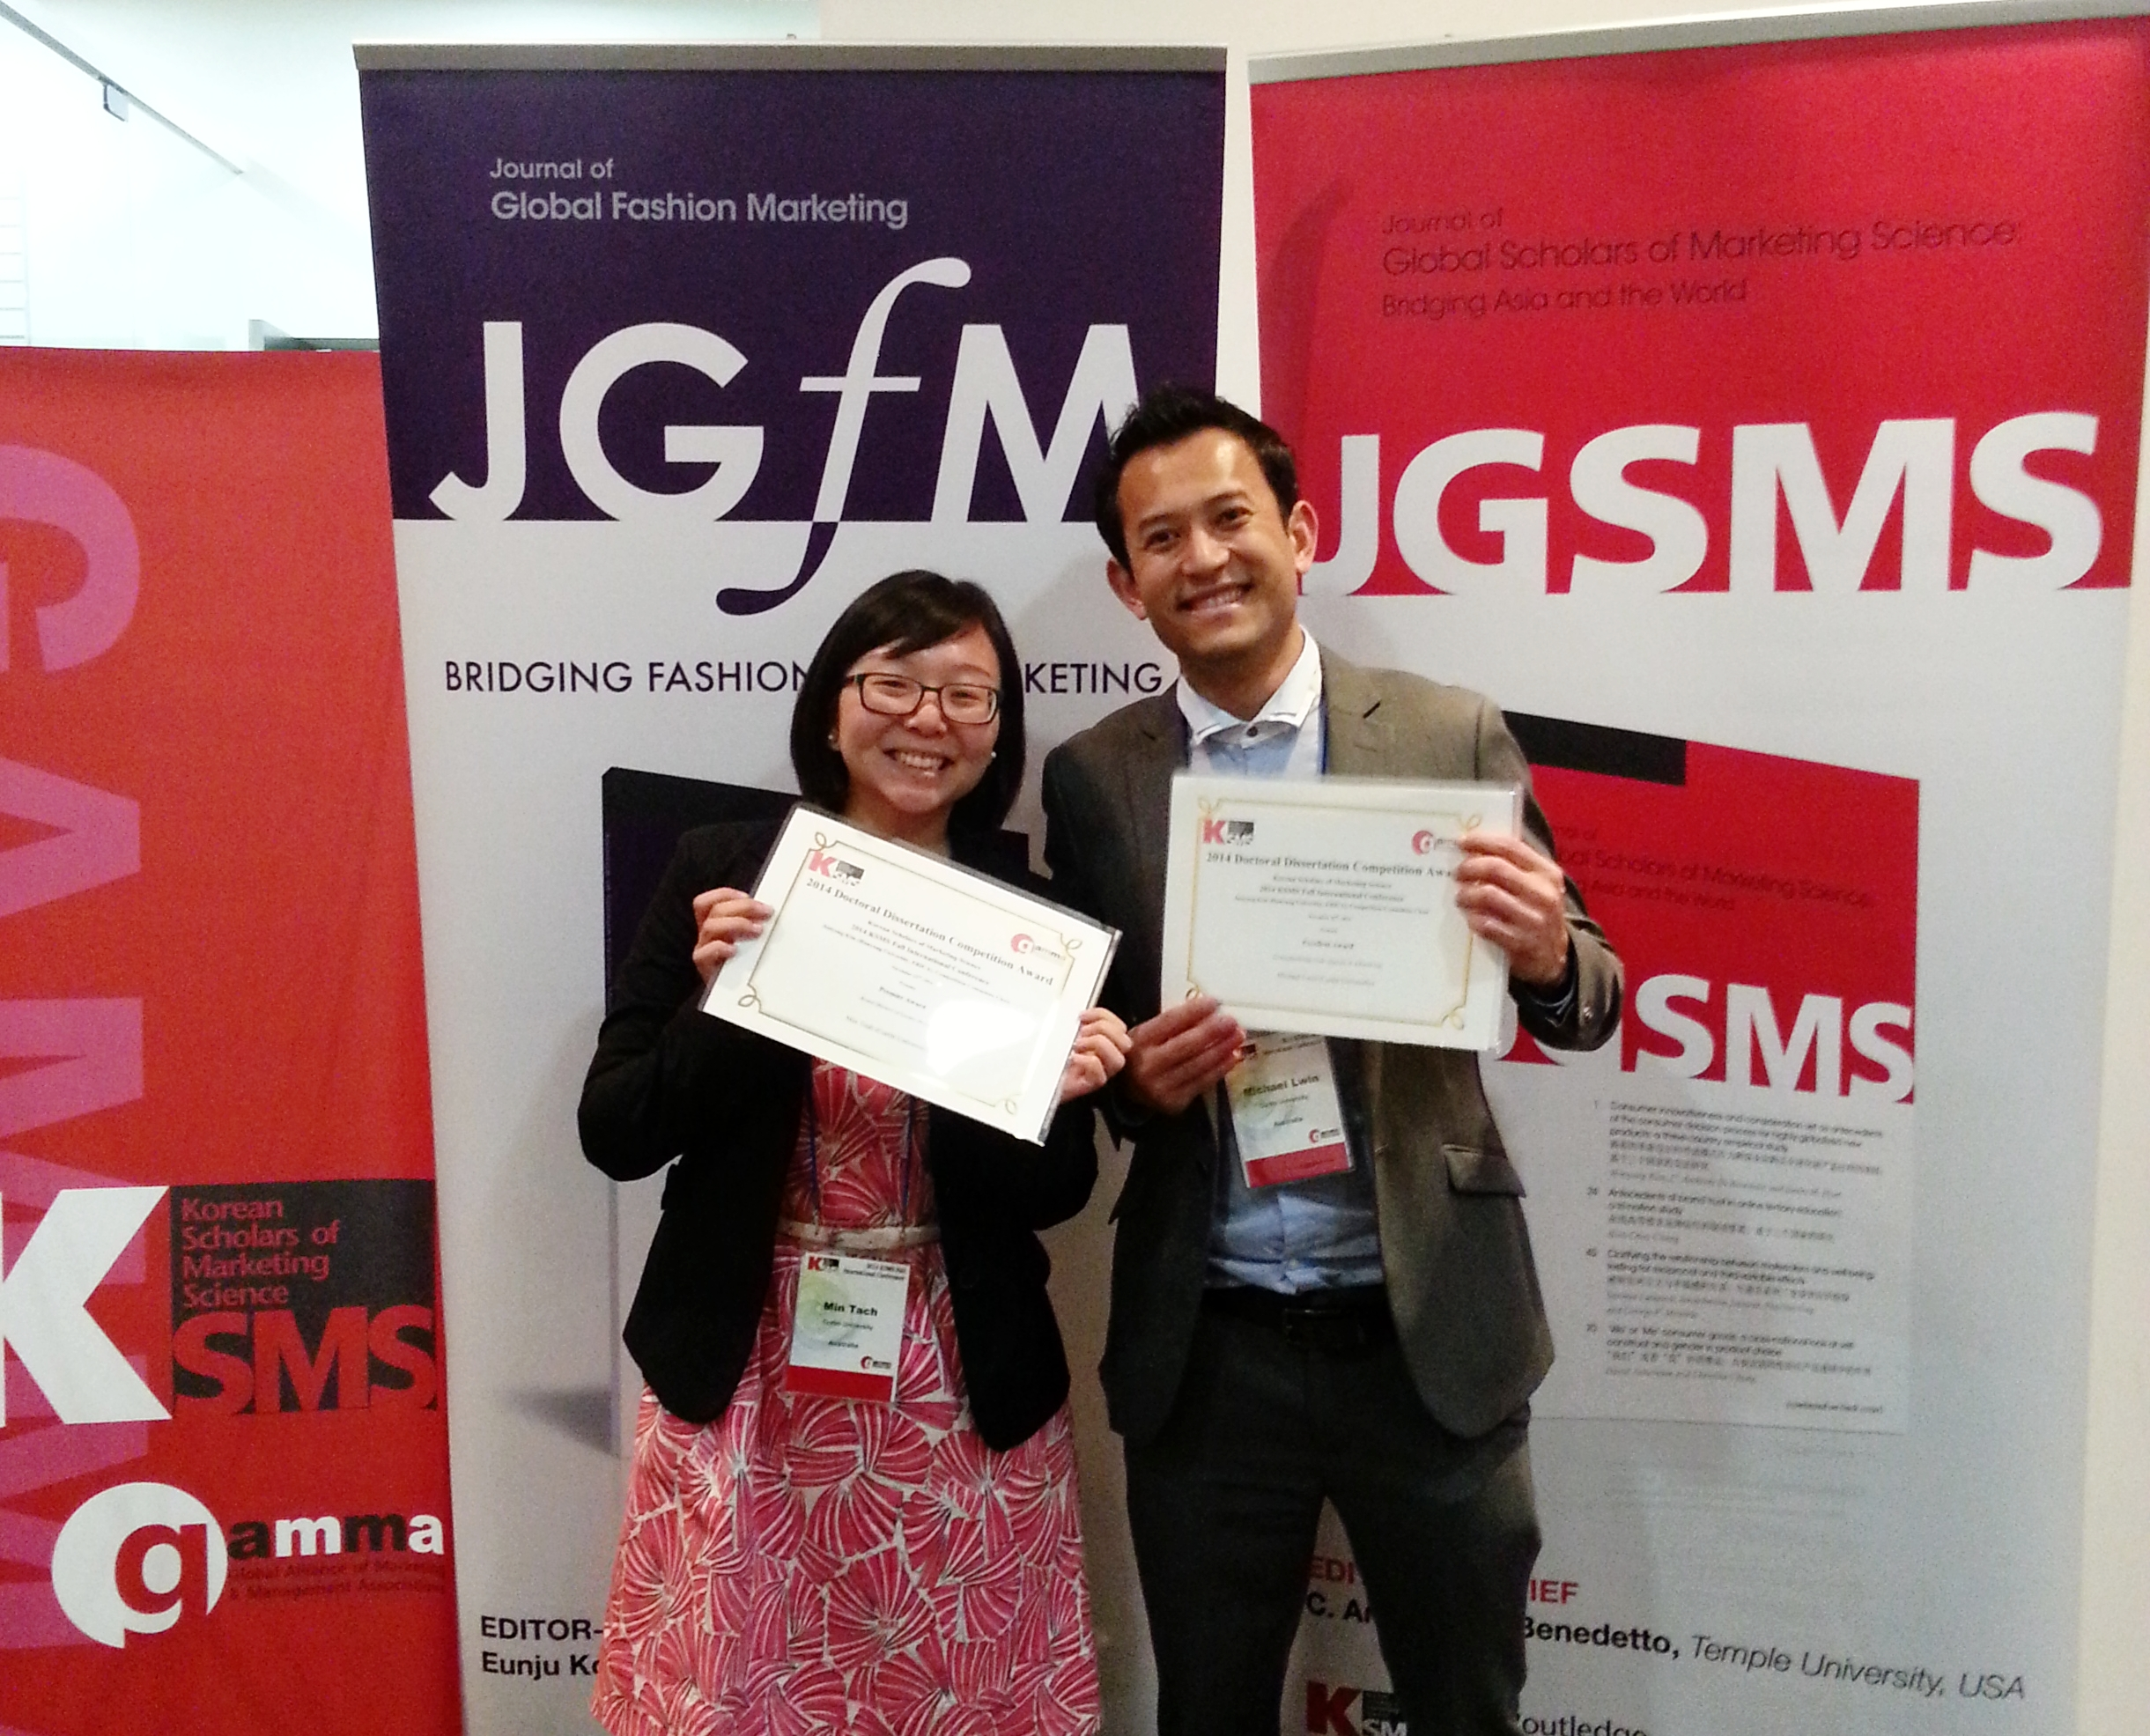 Dr. Min Teah and Dr. Michael Lwin win award at KSMS Conference 2014